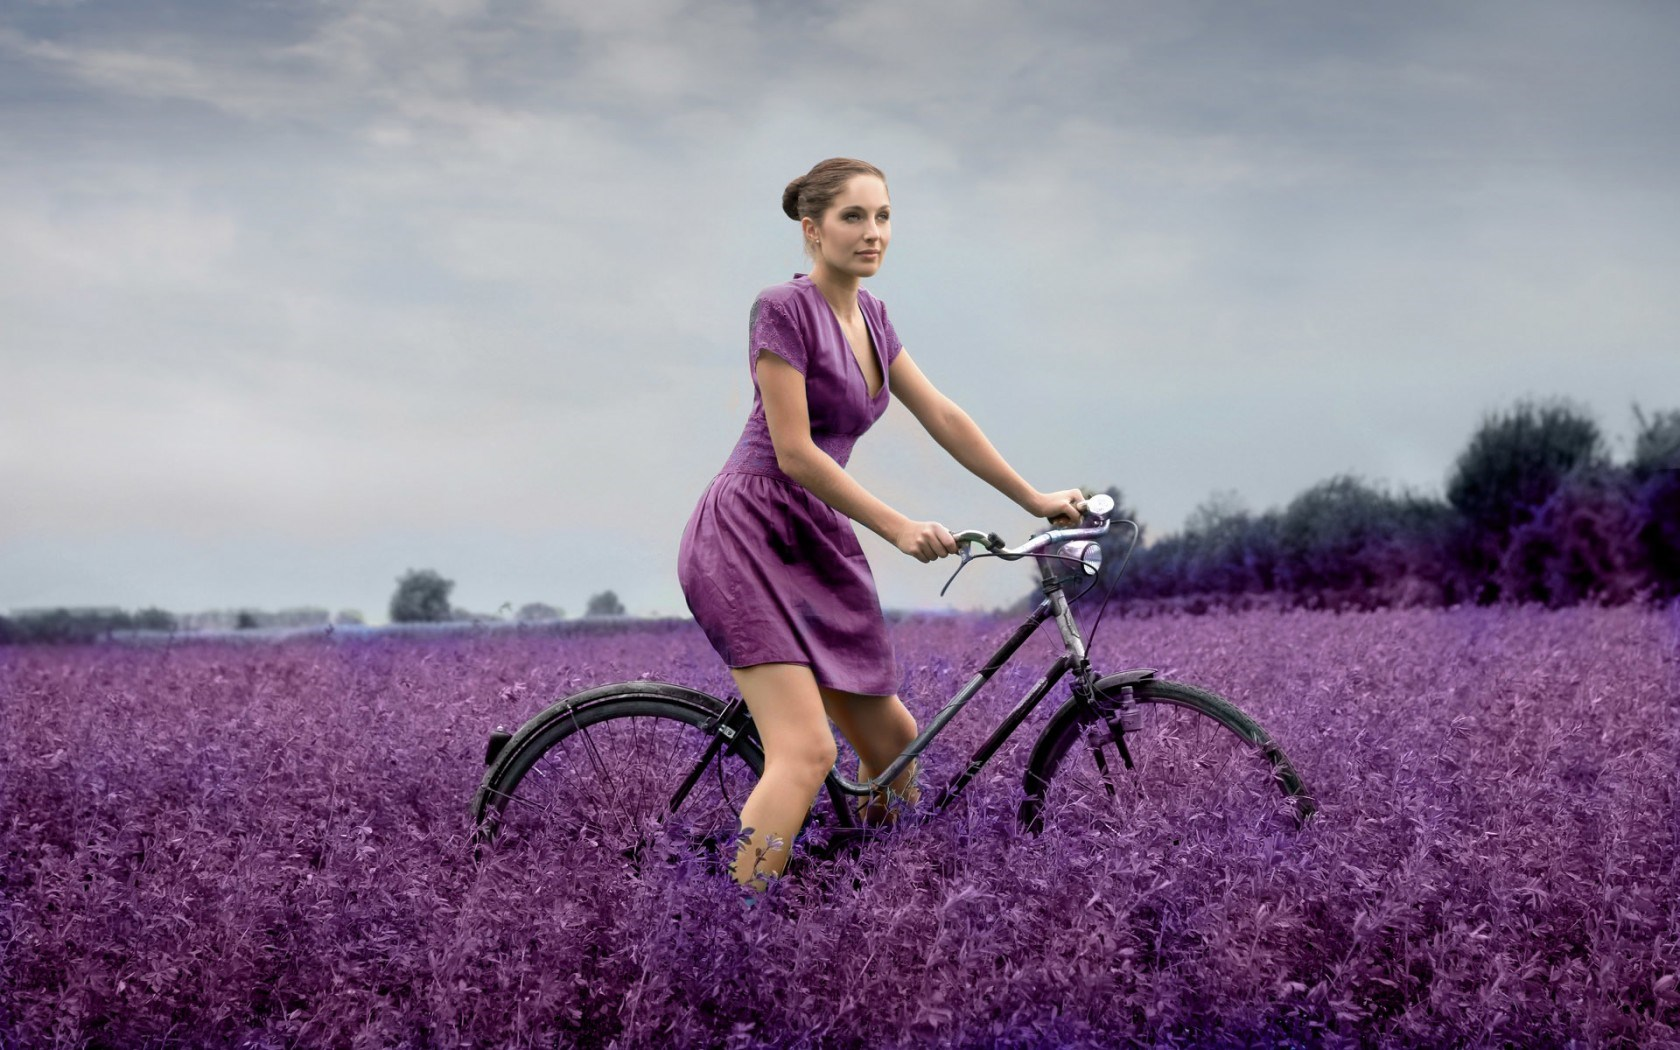 desktop wallpaper bicycles and flowers wallpapersafari. Black Bedroom Furniture Sets. Home Design Ideas